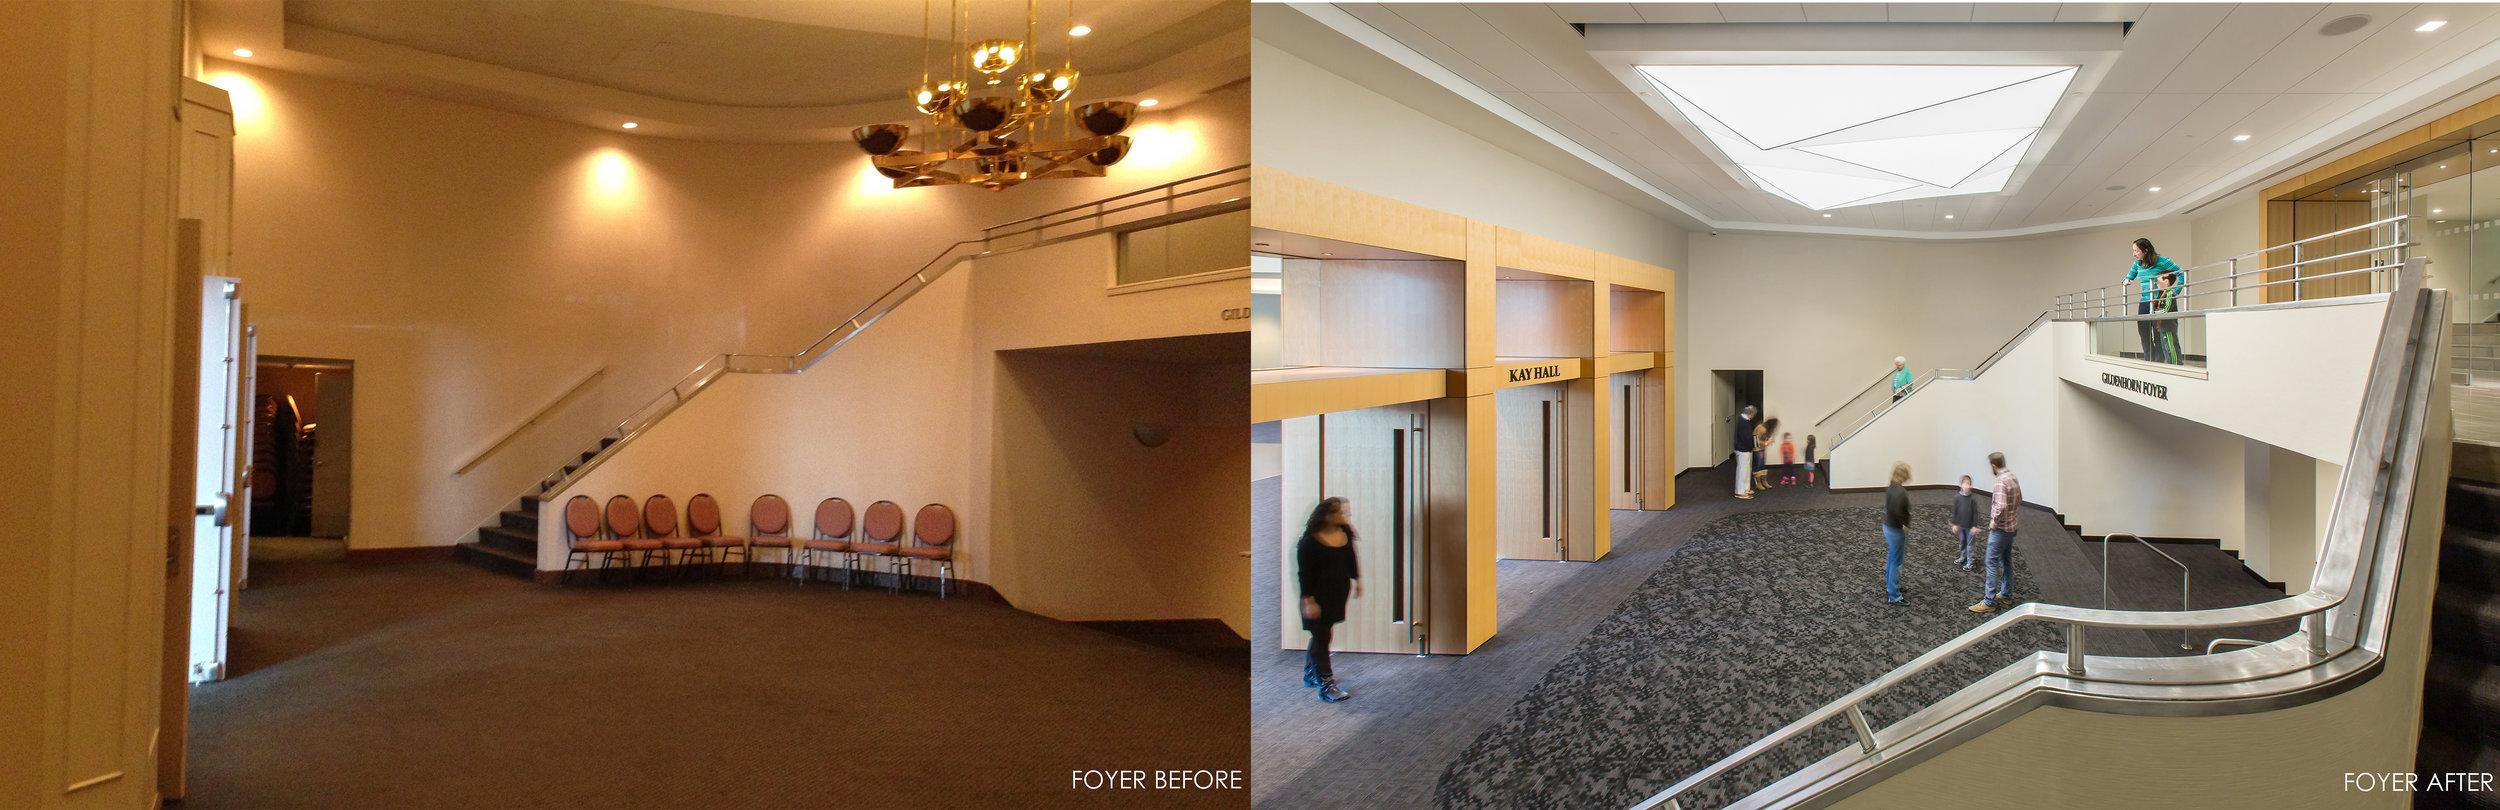 Foyer Comparison.jpg